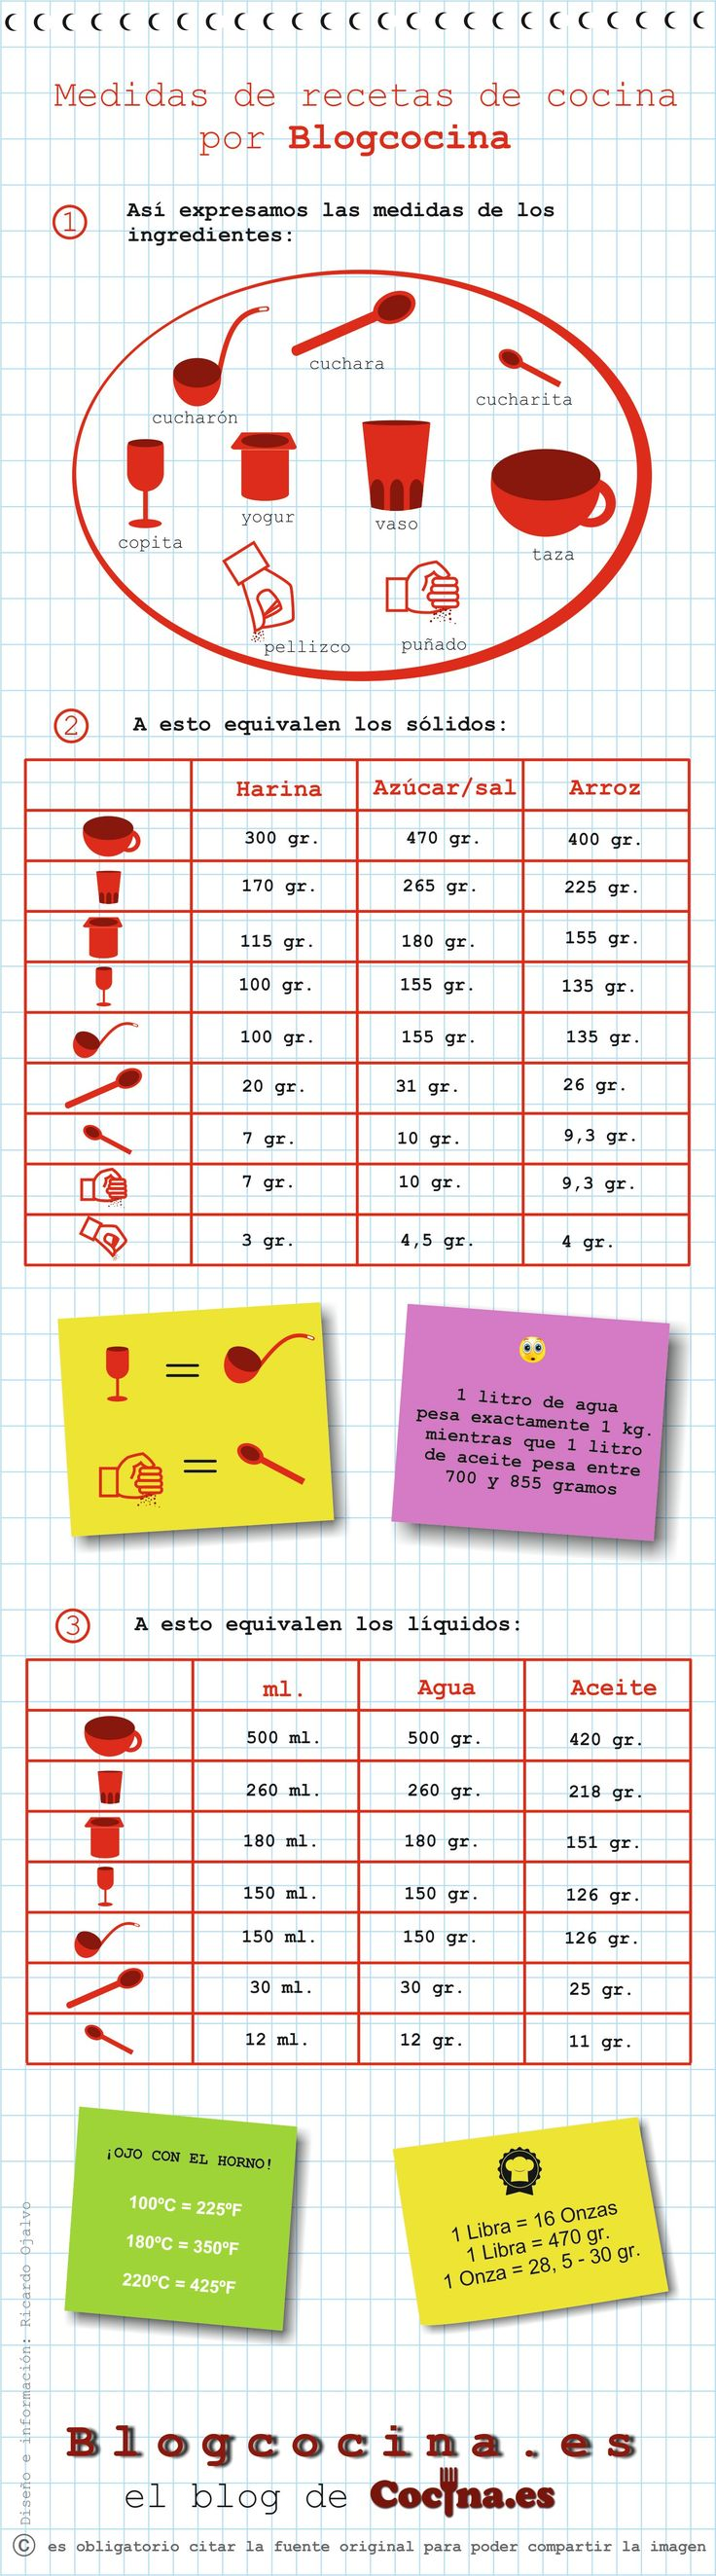 Tabla de equivalencias para cocina [Infografía] http://www.blogcocina.es/2013/03/14/tabla-de-equivalencias-para-cocina/